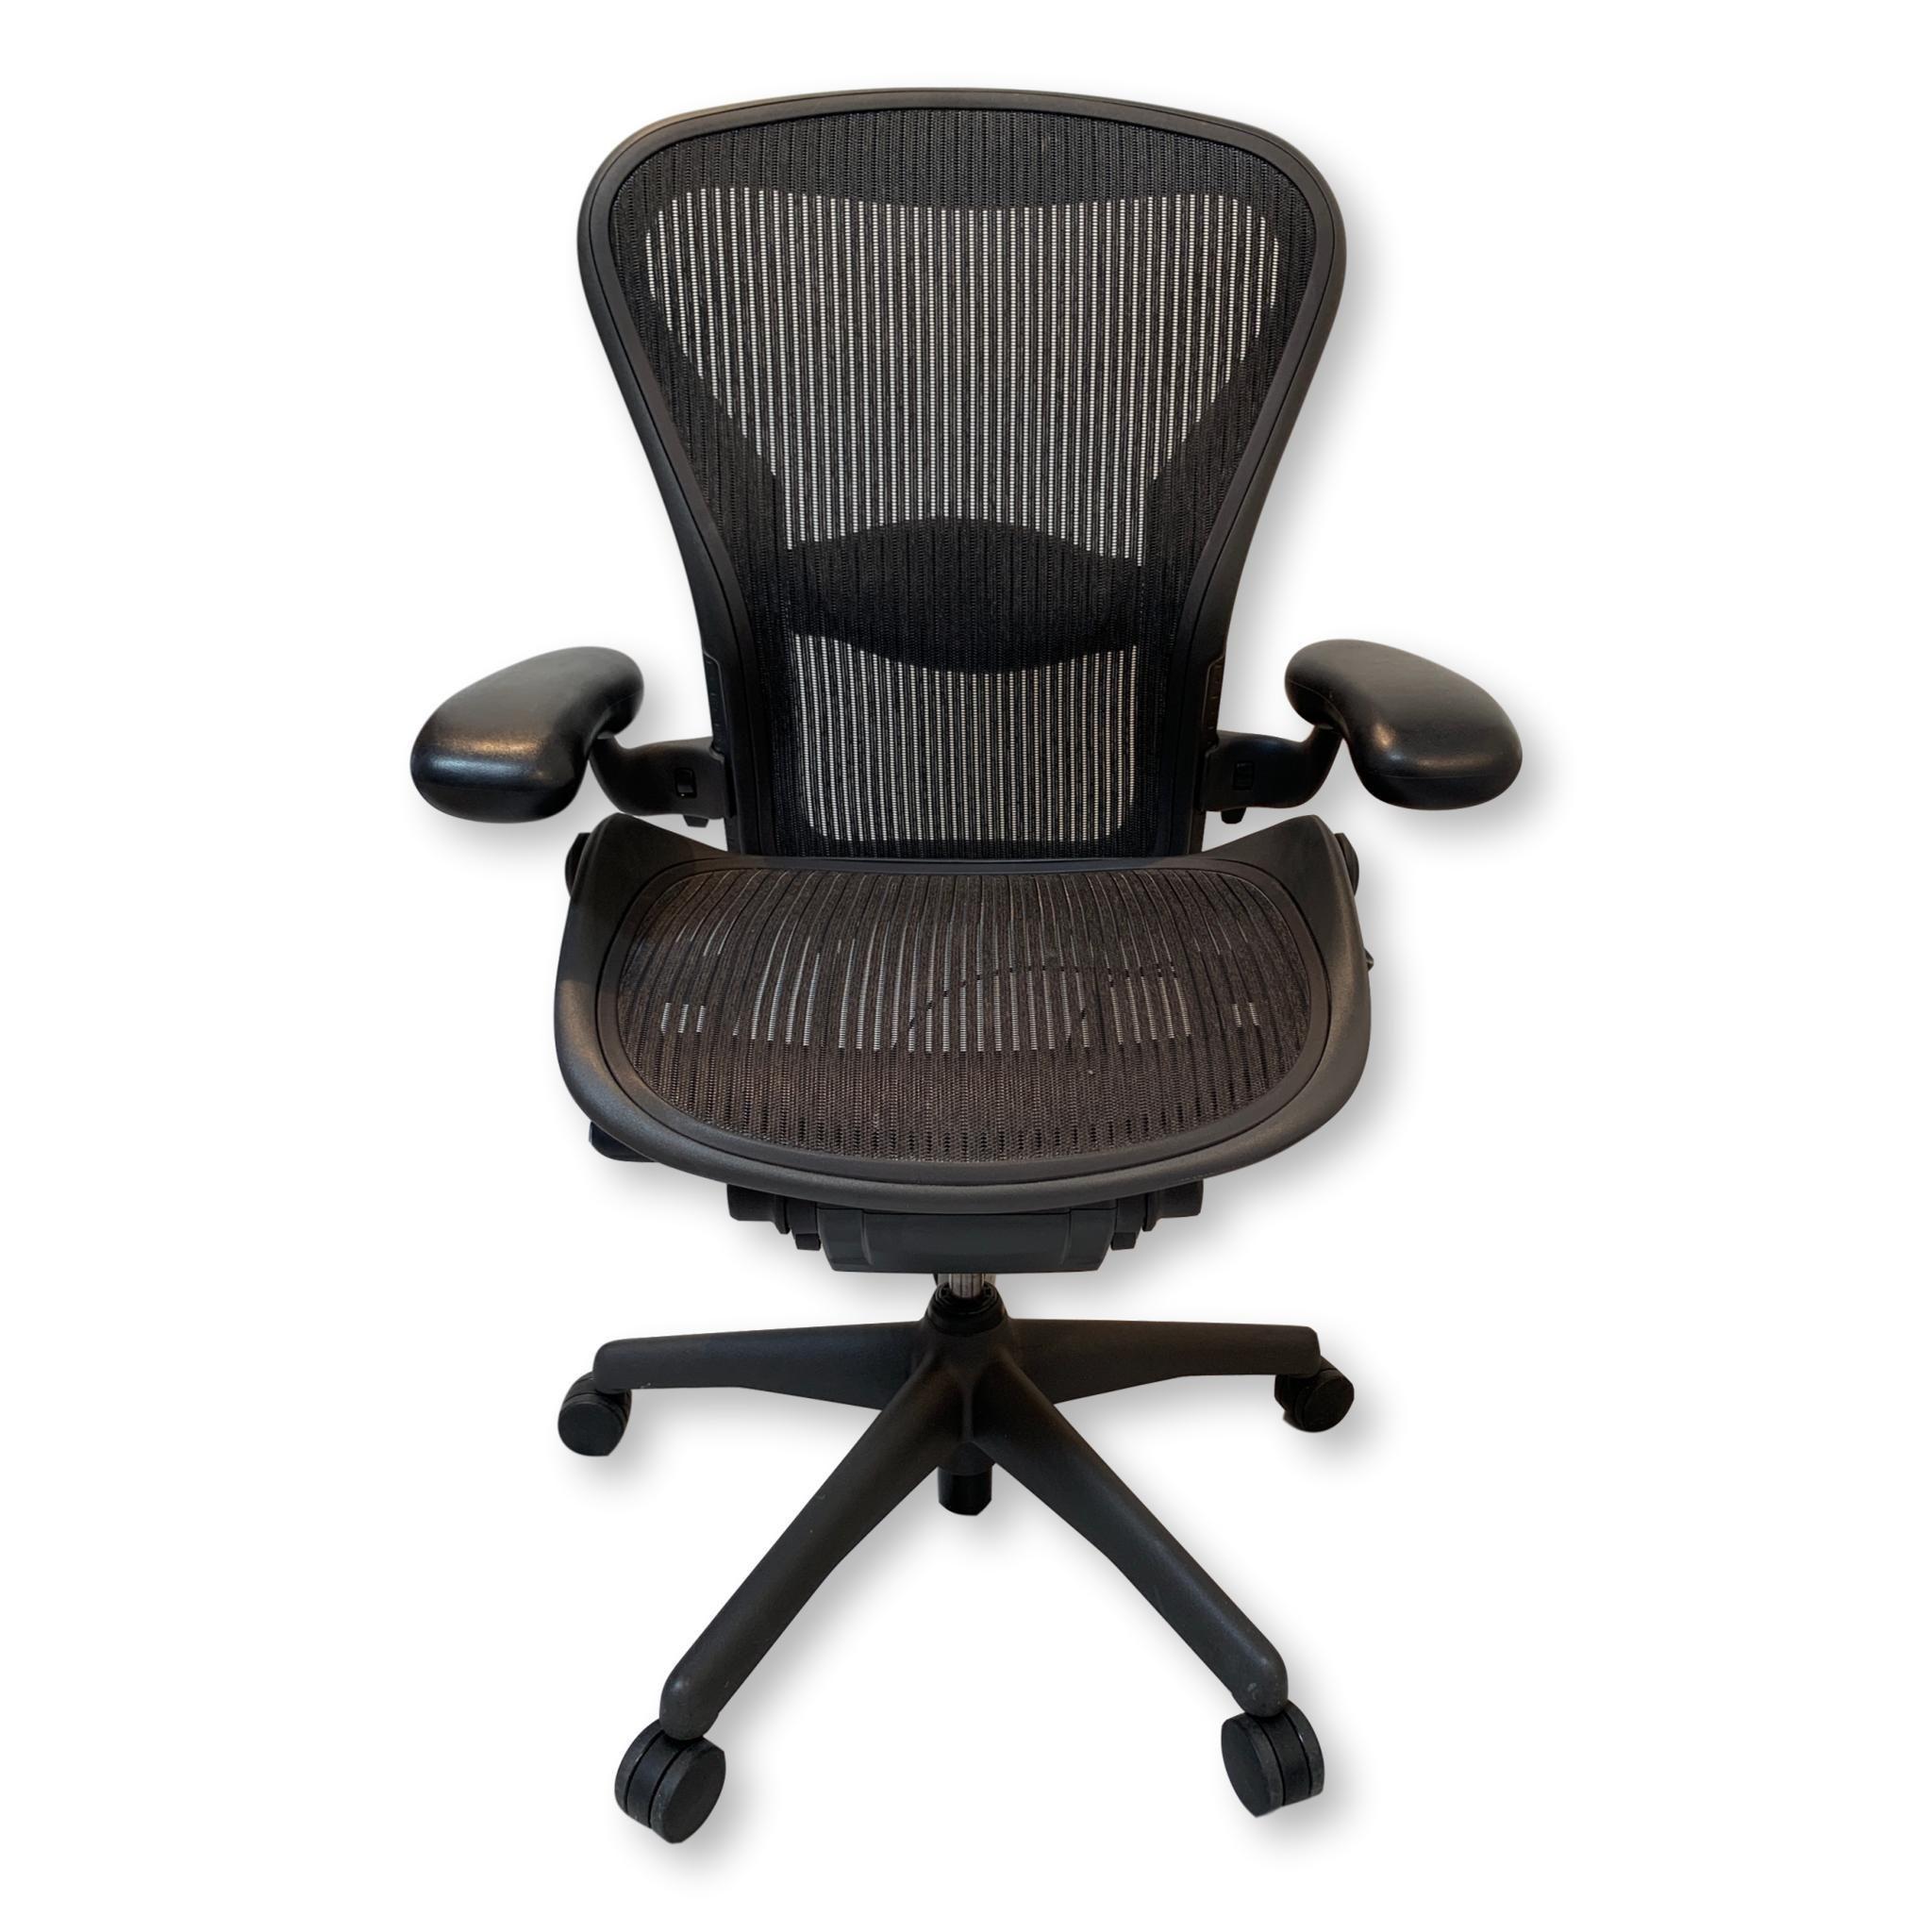 Herman miller aeron chair fully featuredsize c herman